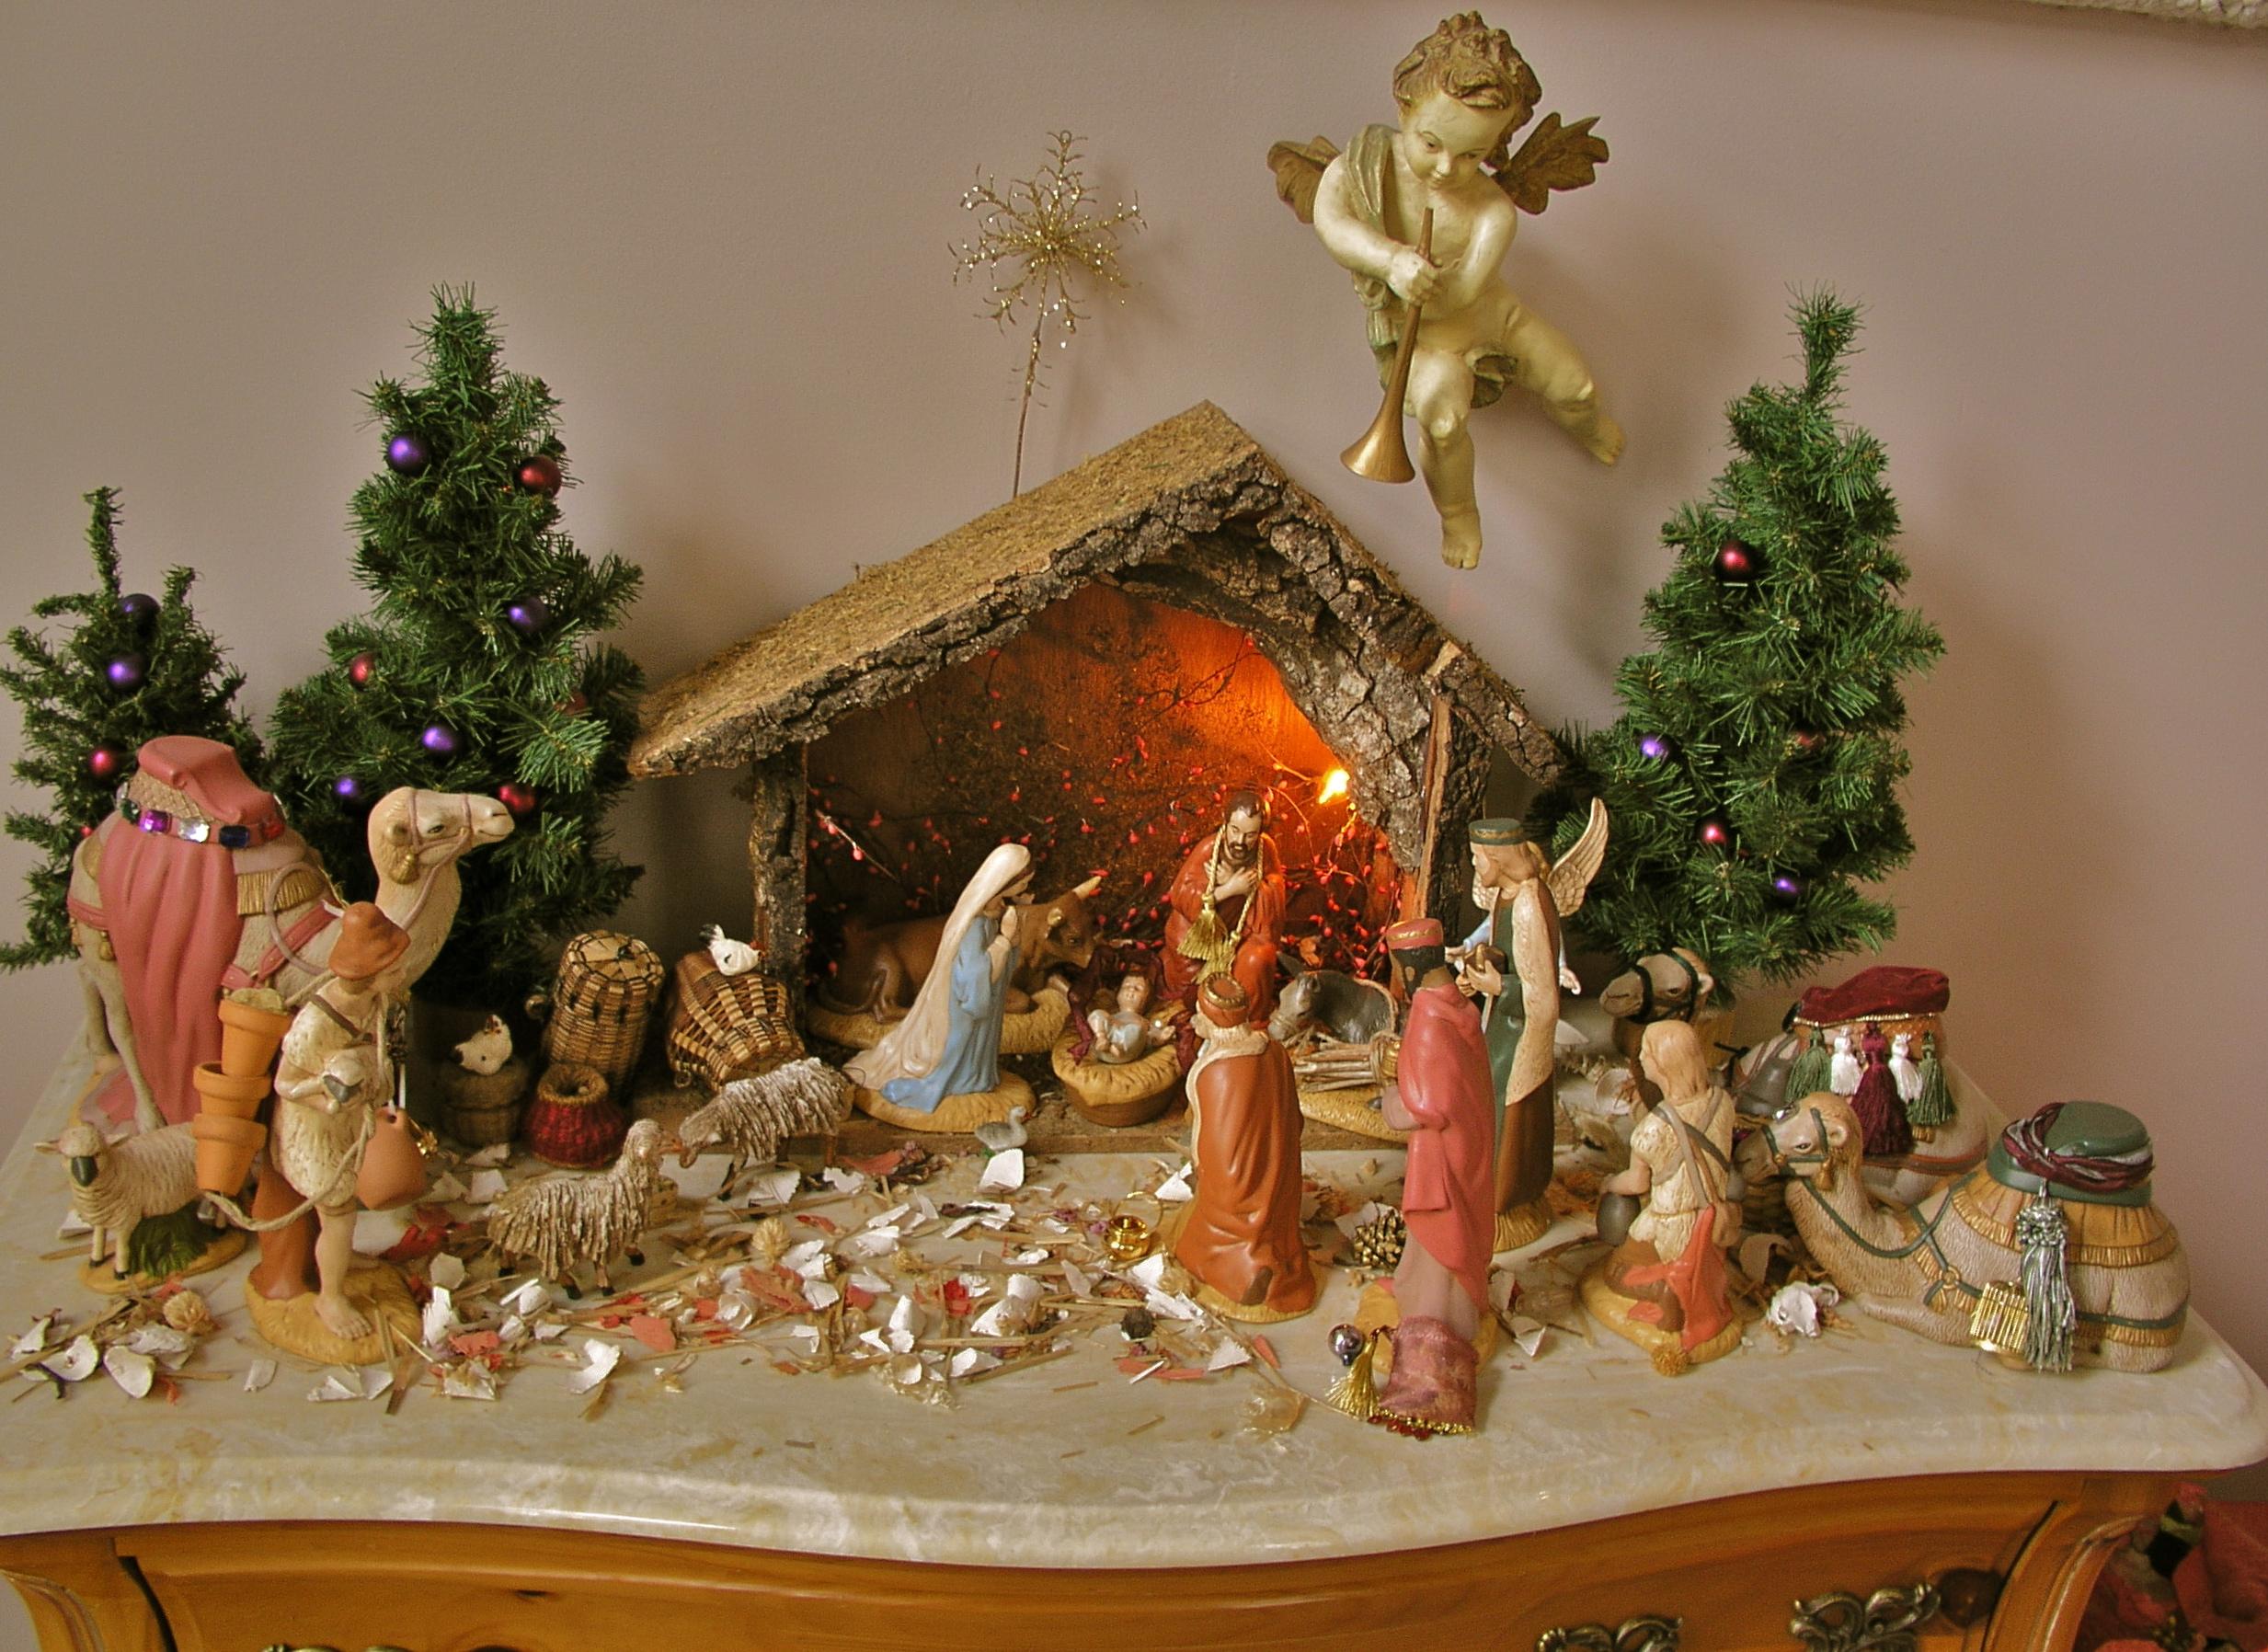 Worksheet Christmas Nativity Printable